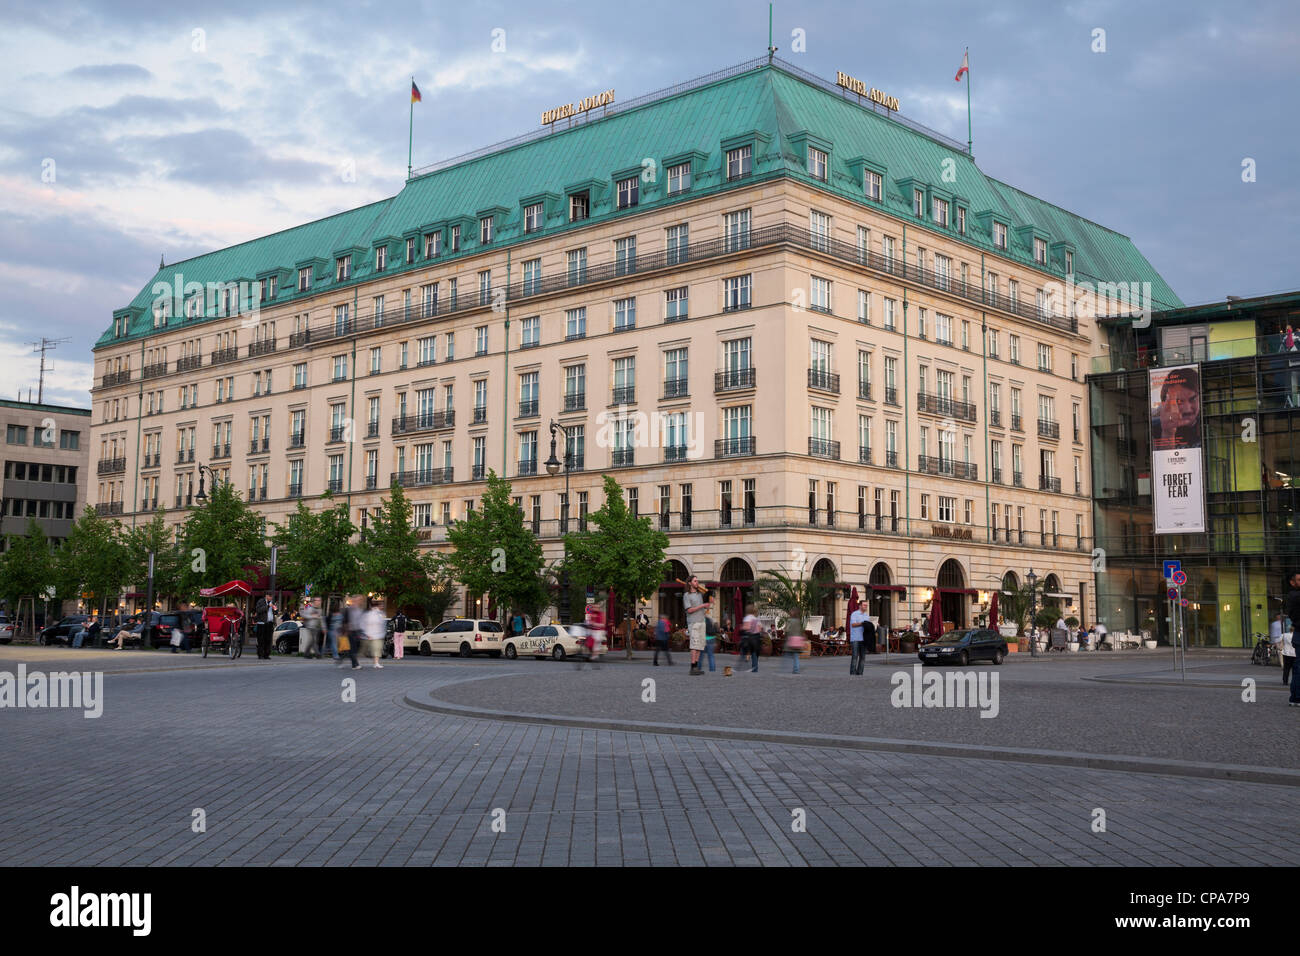 Hotel Adlon Kempinski on Pariser Platz, Berlin, Germany - Stock Image